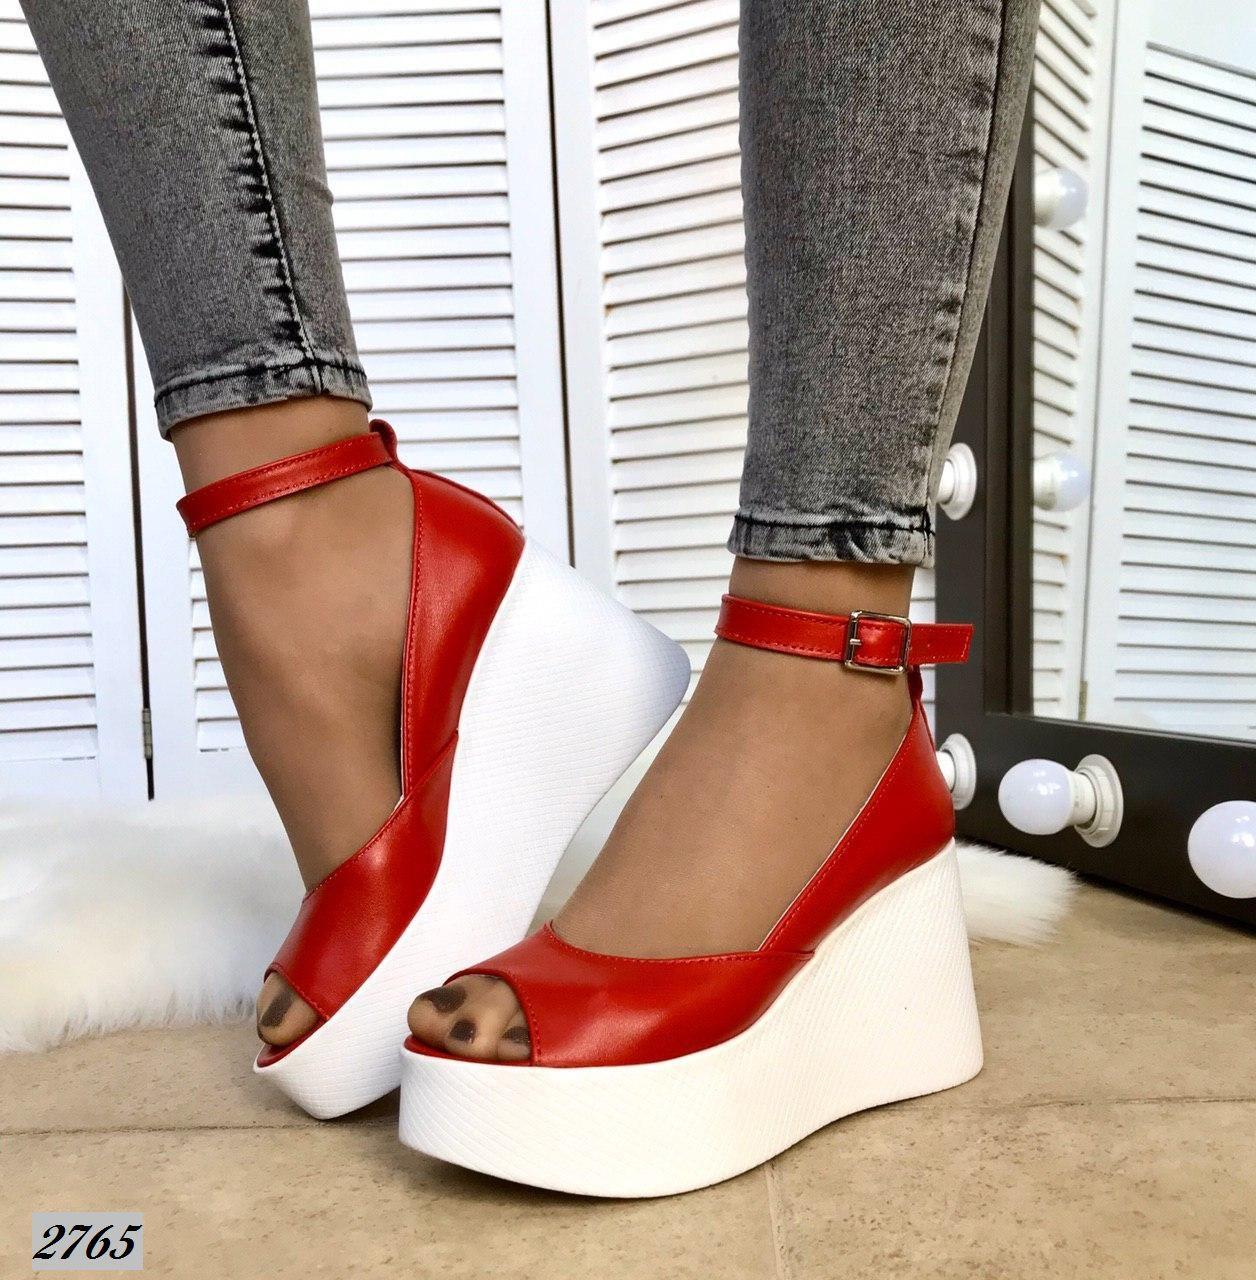 Туфли на платформе с ремешком. Размер 37 40